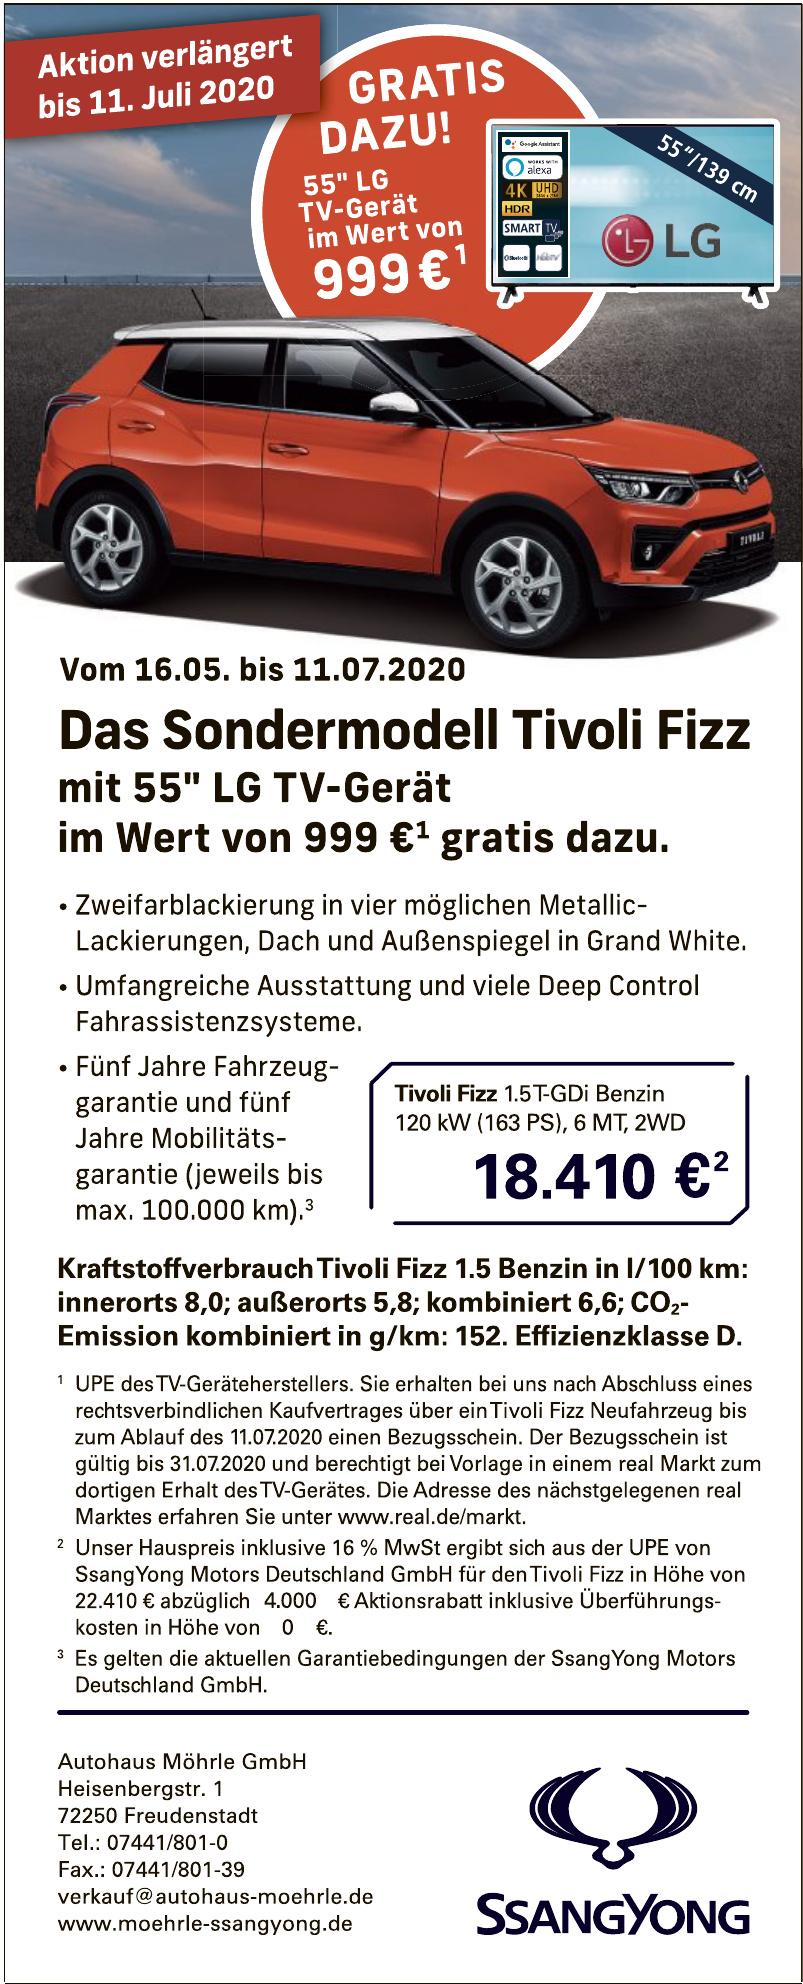 Autohaus Möhrle GmbH